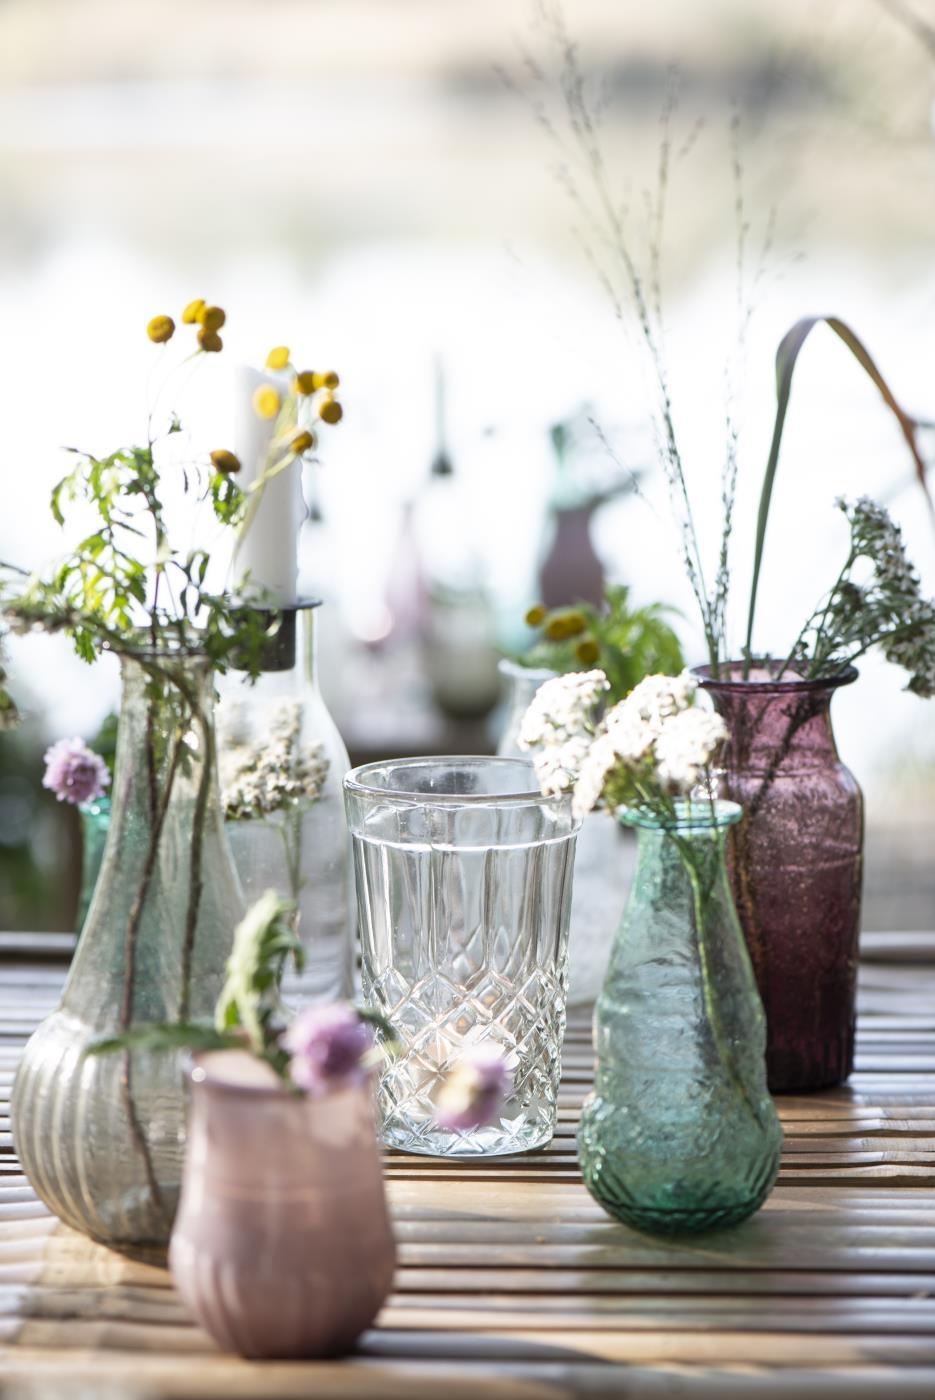 Vasetti in vetro riciclato